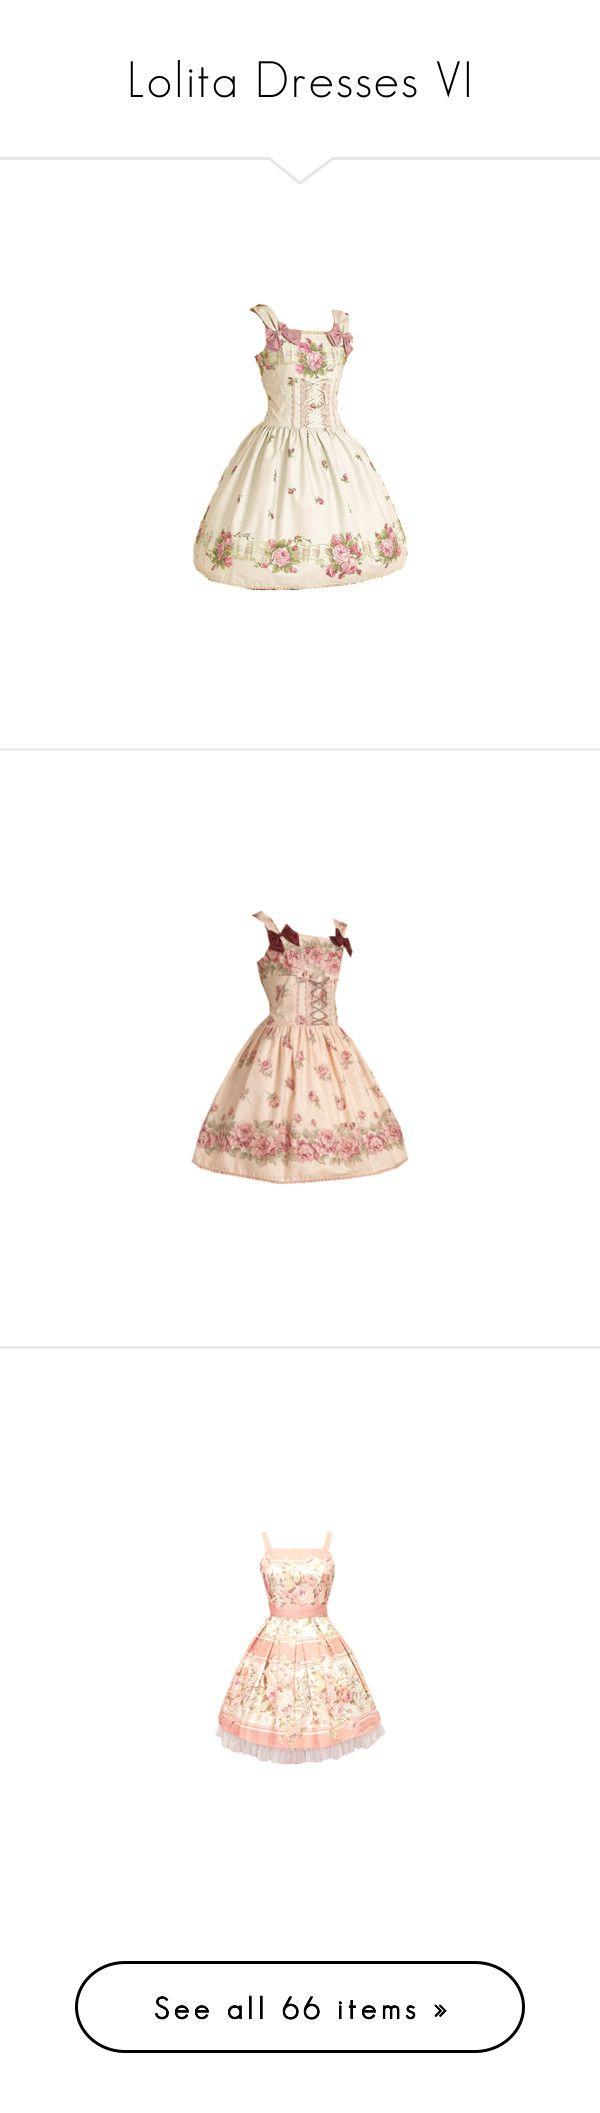 """Lolita Dresses VI"" by ck0427 ❤ liked on Polyvore featuring dresses, lolita, jsk, brown dress, vintage floral dress, vintage floral print dress, floral print dress, gothic dresses, vintage prom dresses and nude dress"